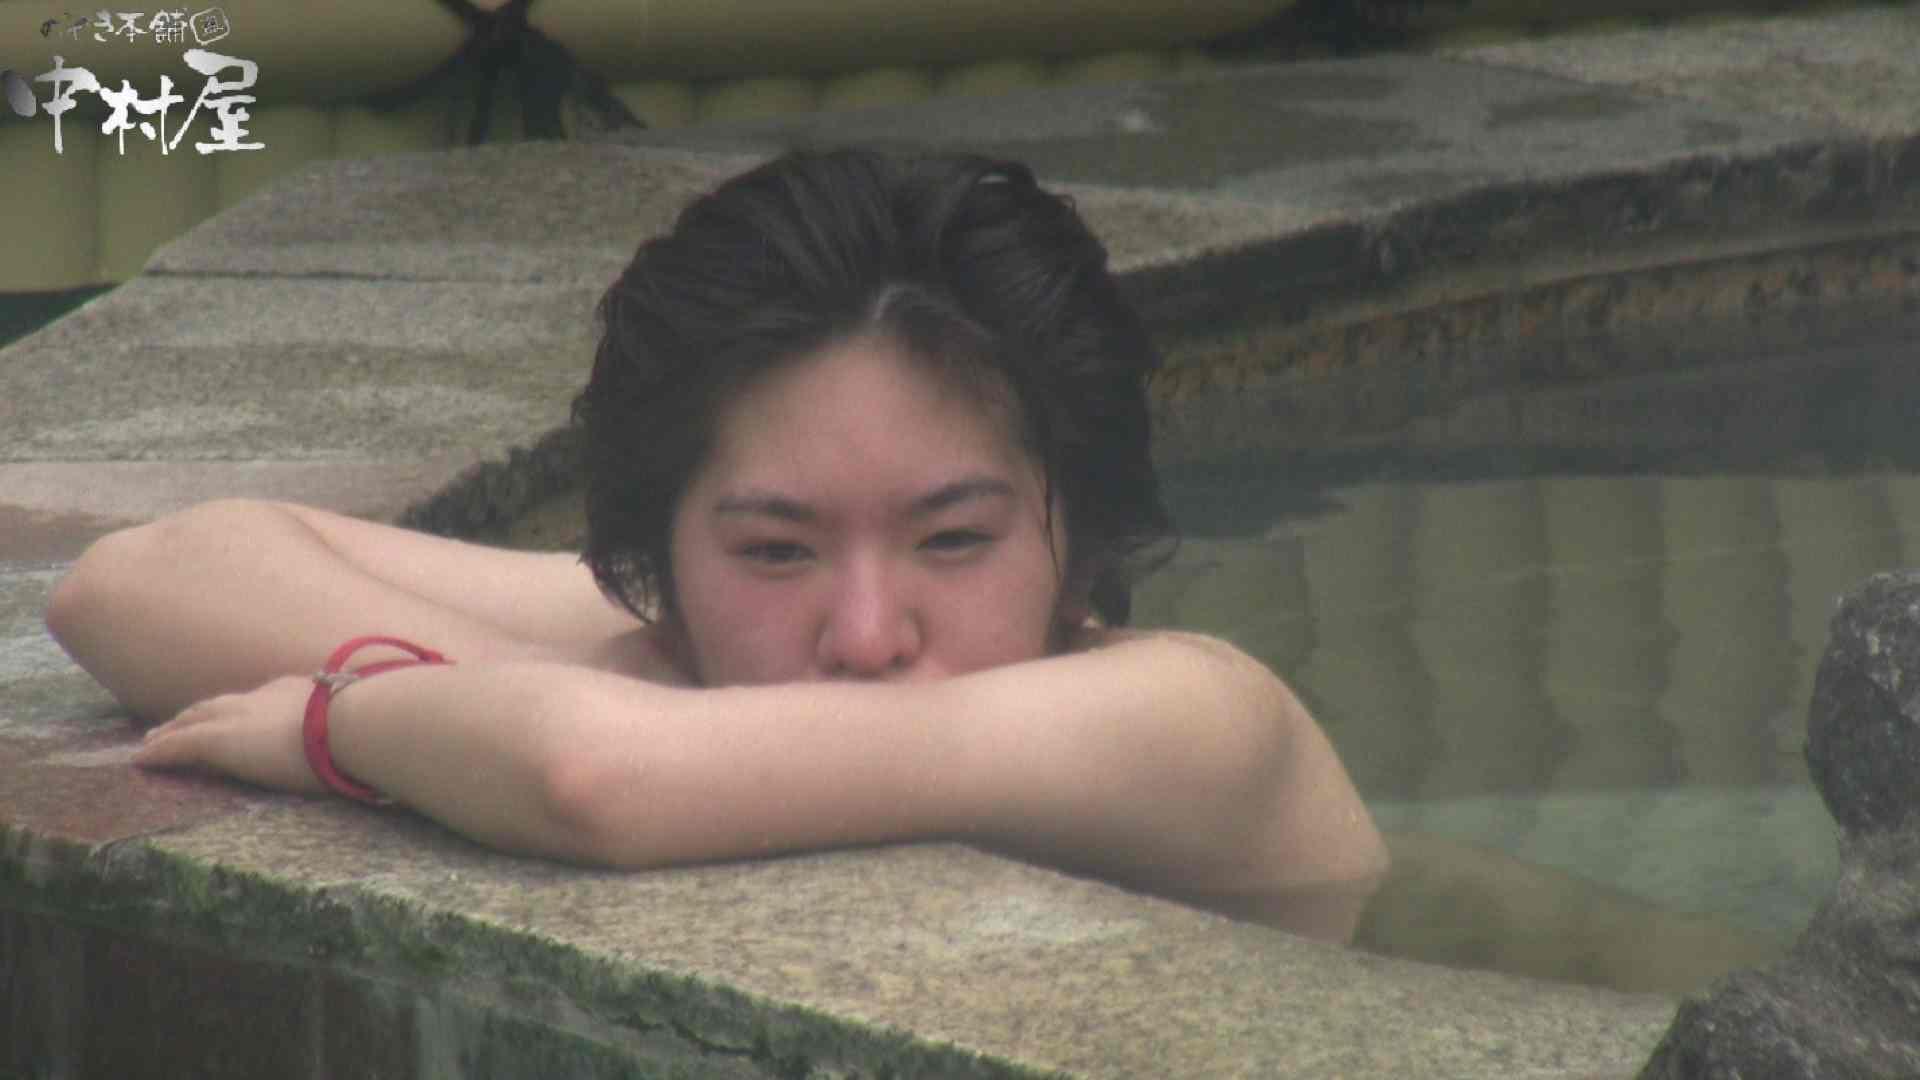 Aquaな露天風呂Vol.907 OL女体  95連発 84